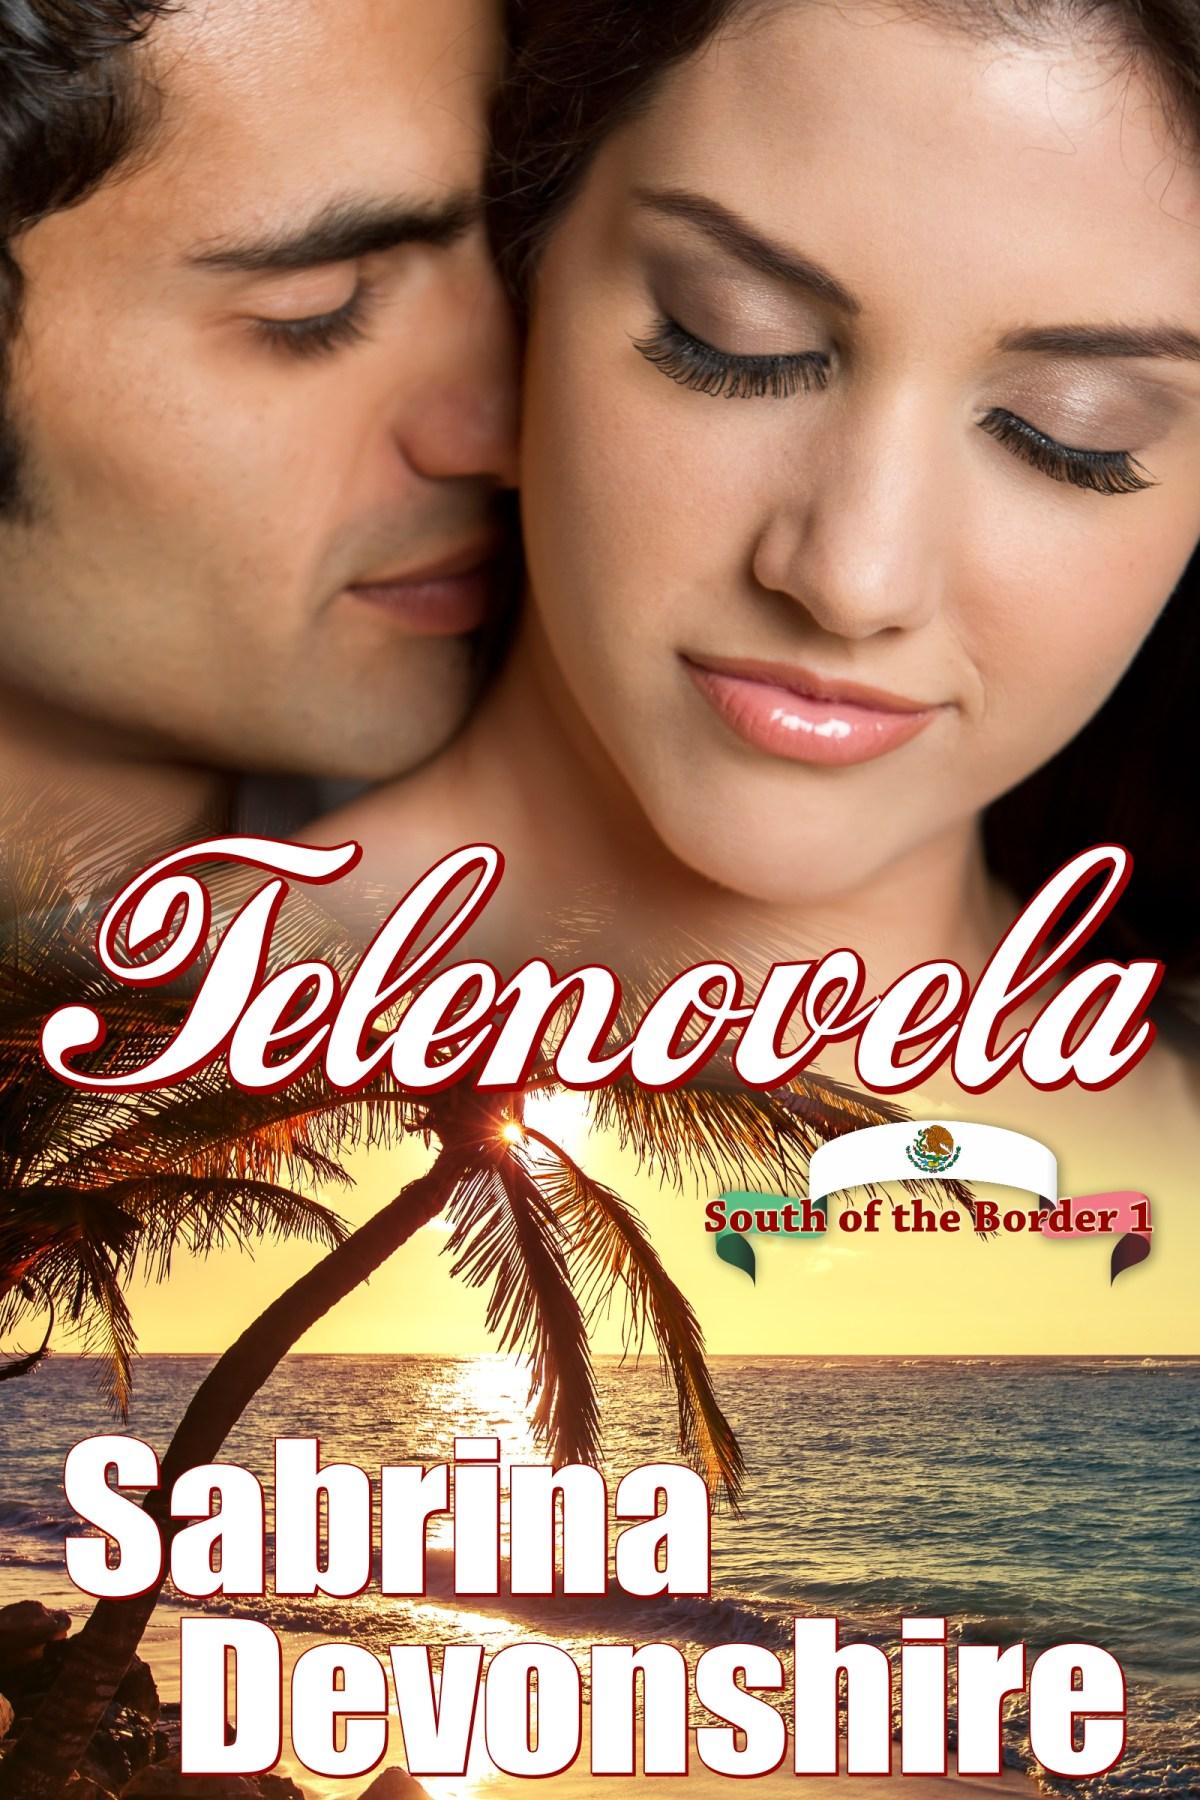 Telenovela (South of the Border 1)